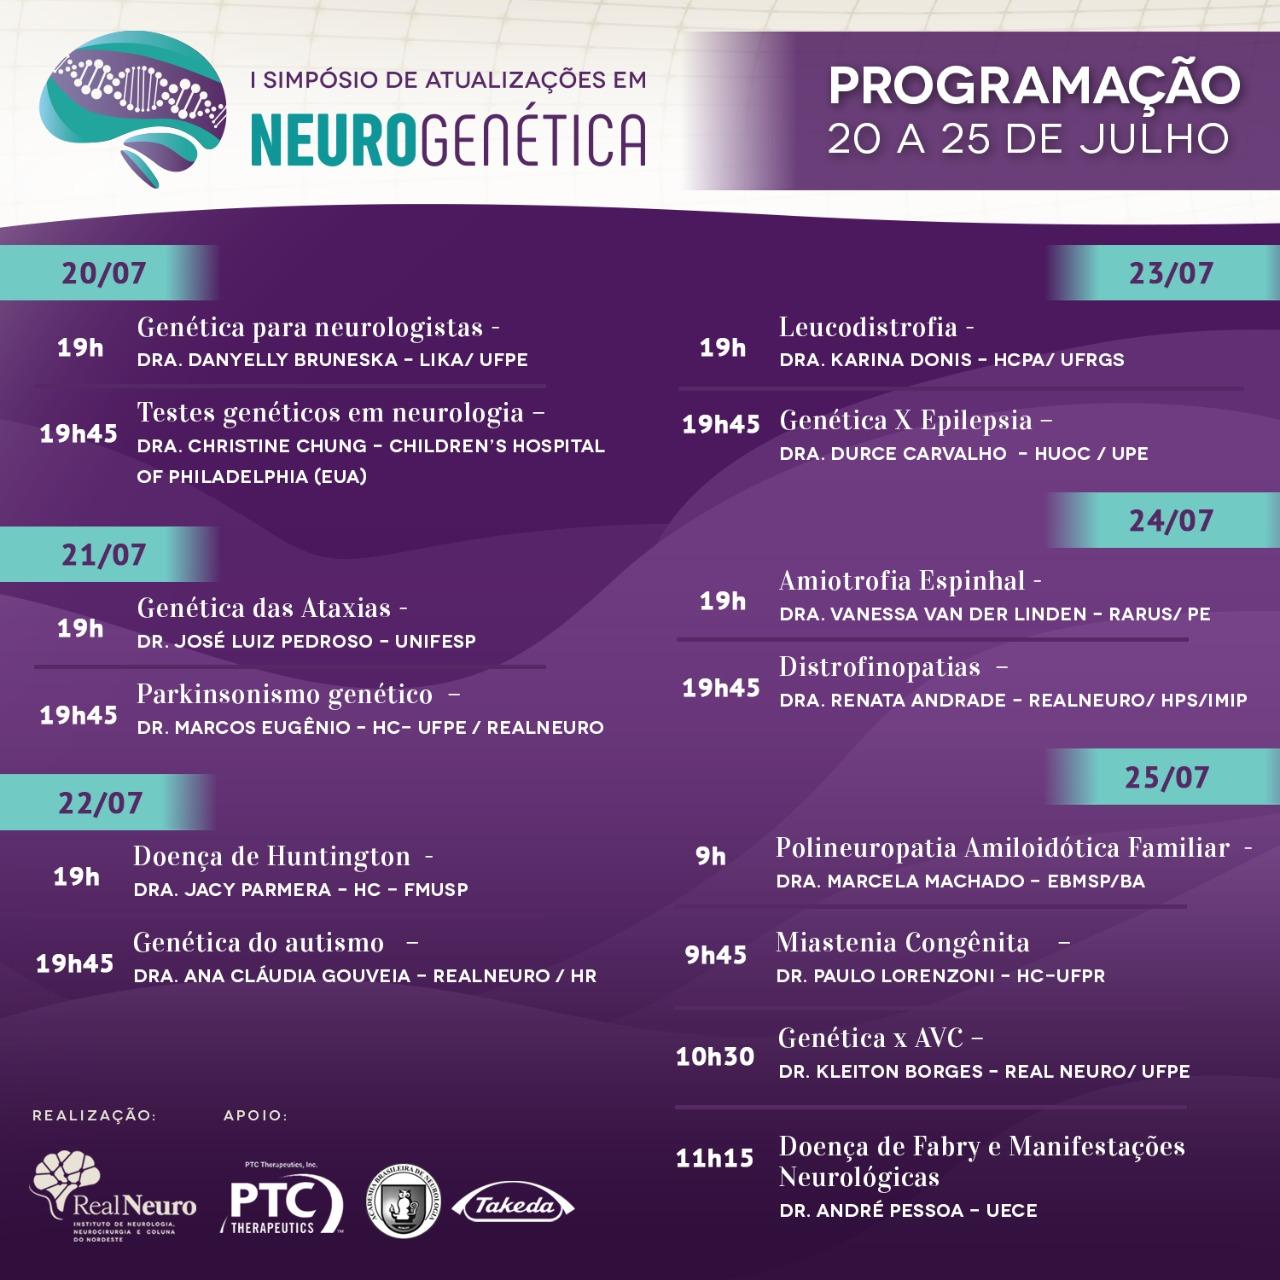 Neurogenética